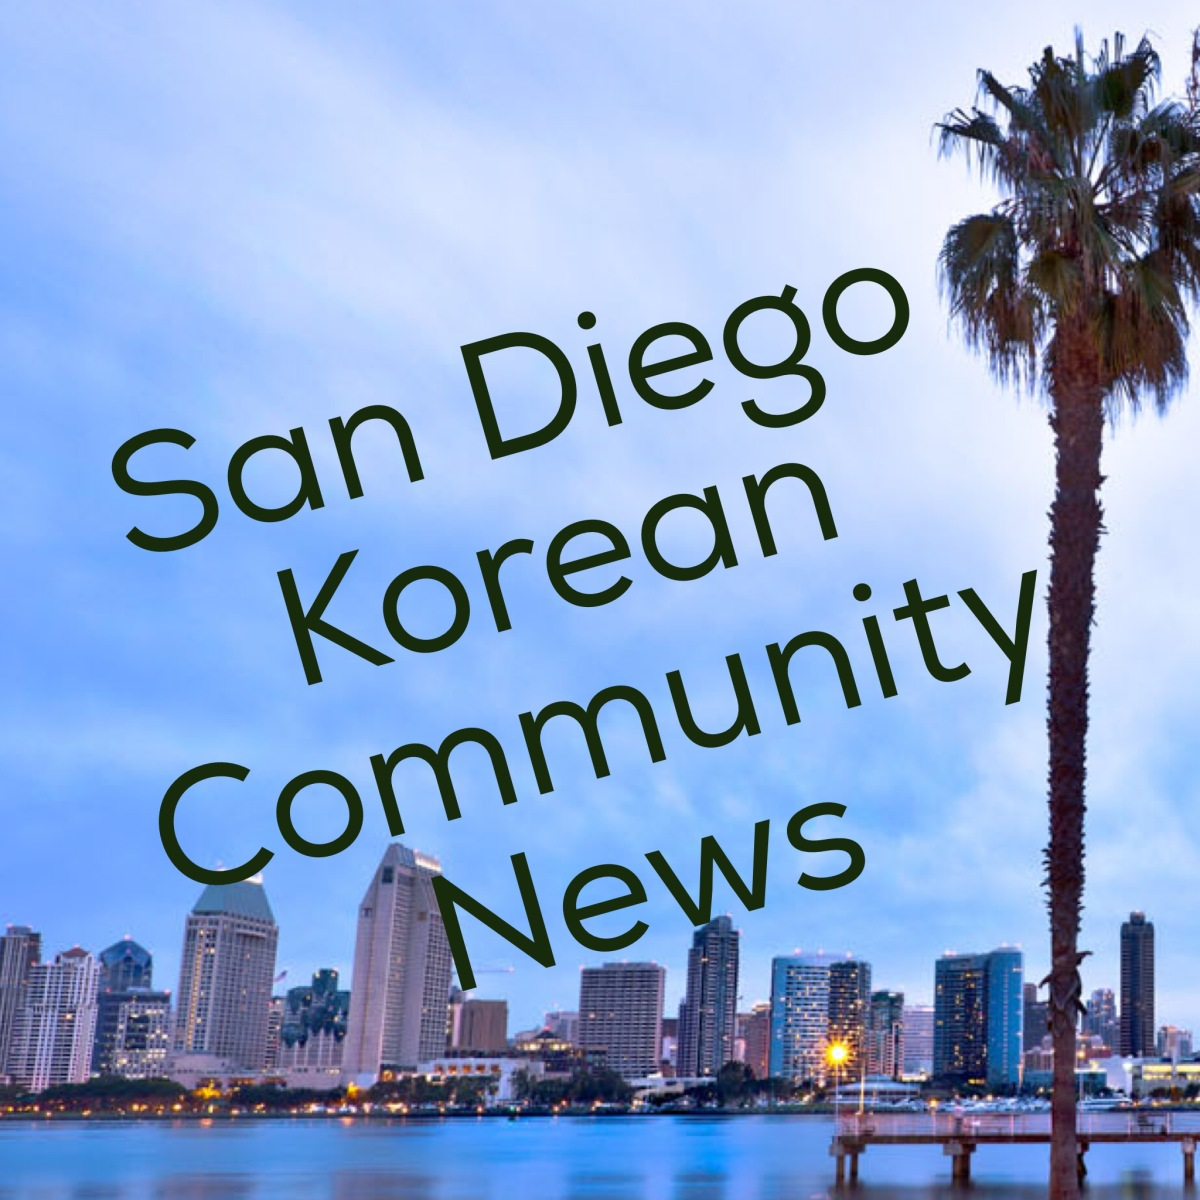 San Diego Korean Community News Briefing – Week of Fri, Dec 23,2016